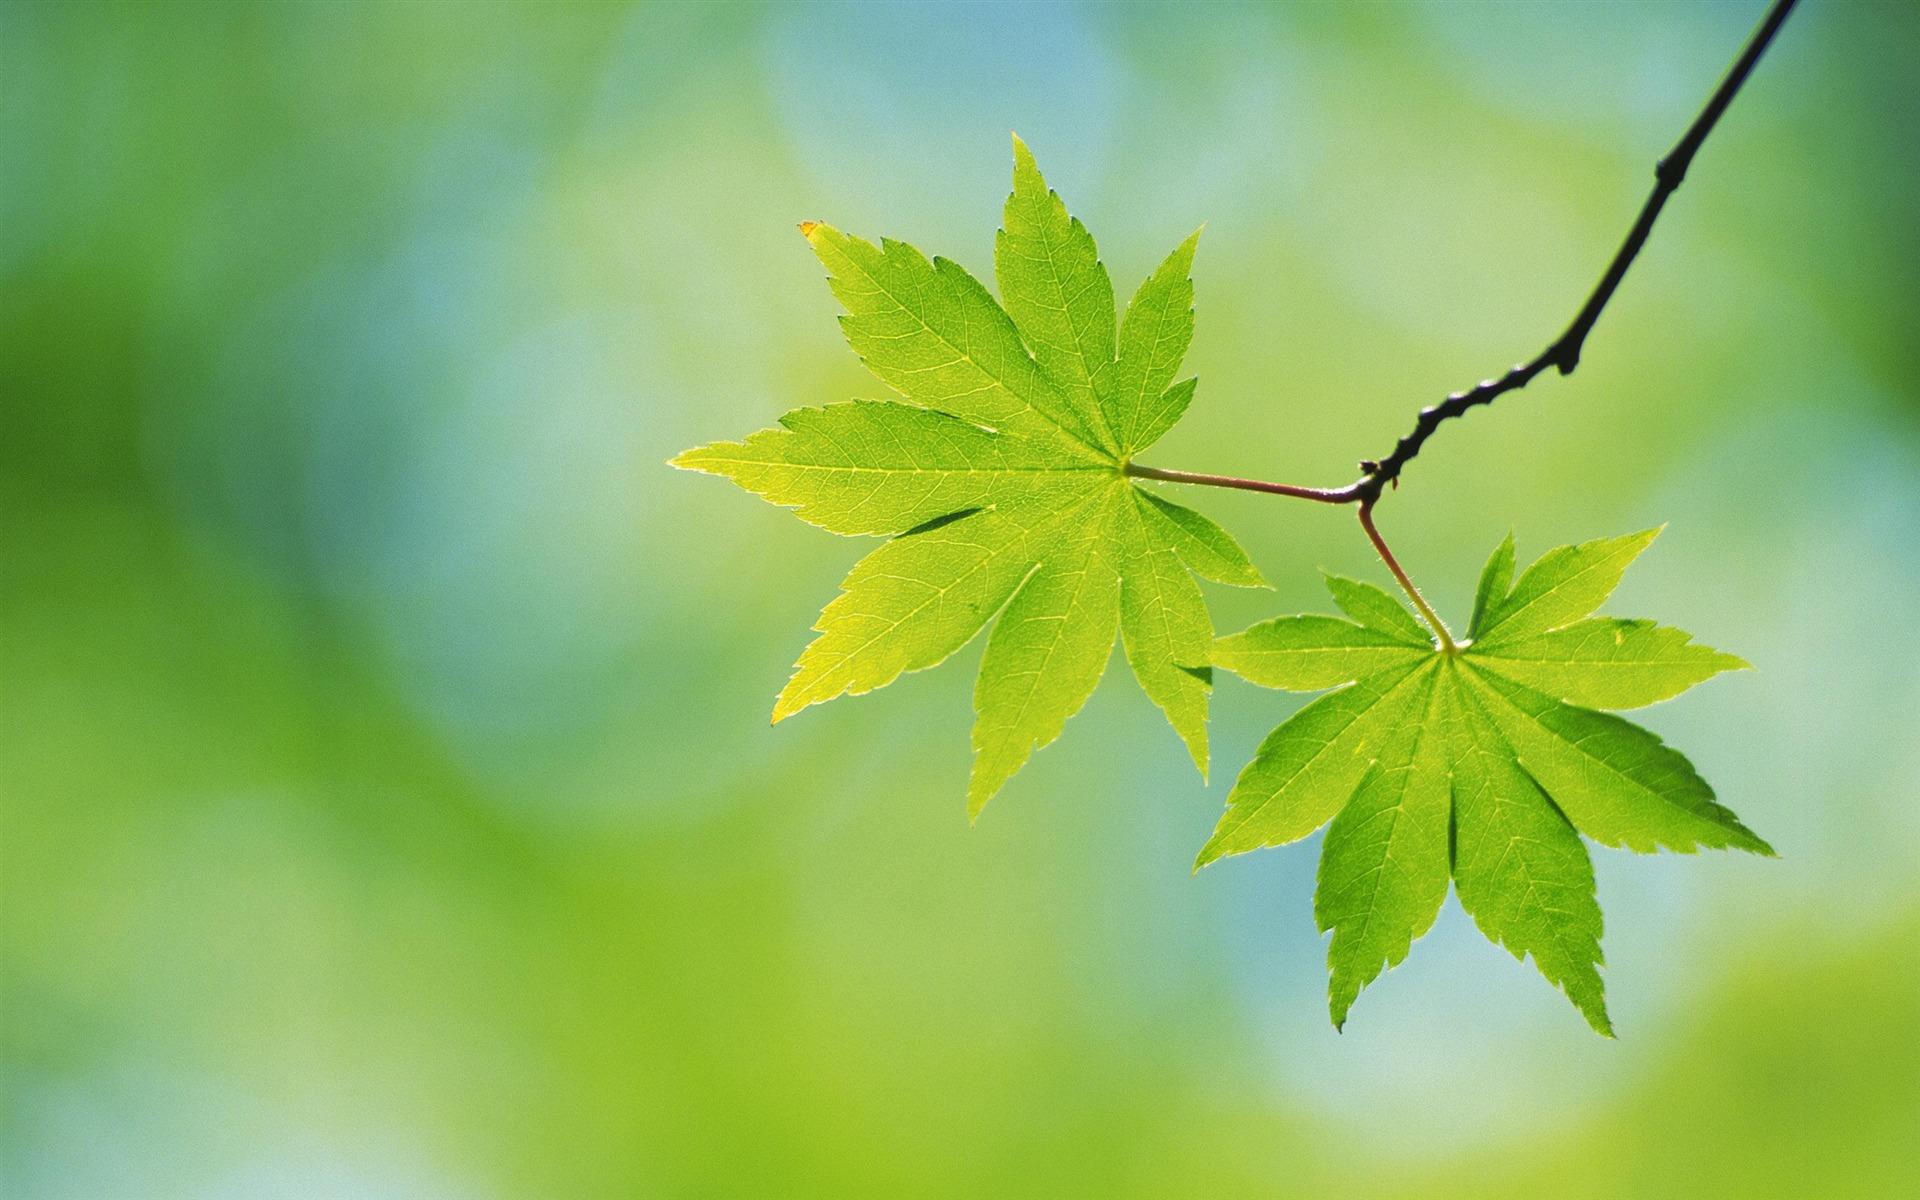 Grandes hojas verdes papel tapiz de flores de cerca 1 - Plantas de hojas verdes ...